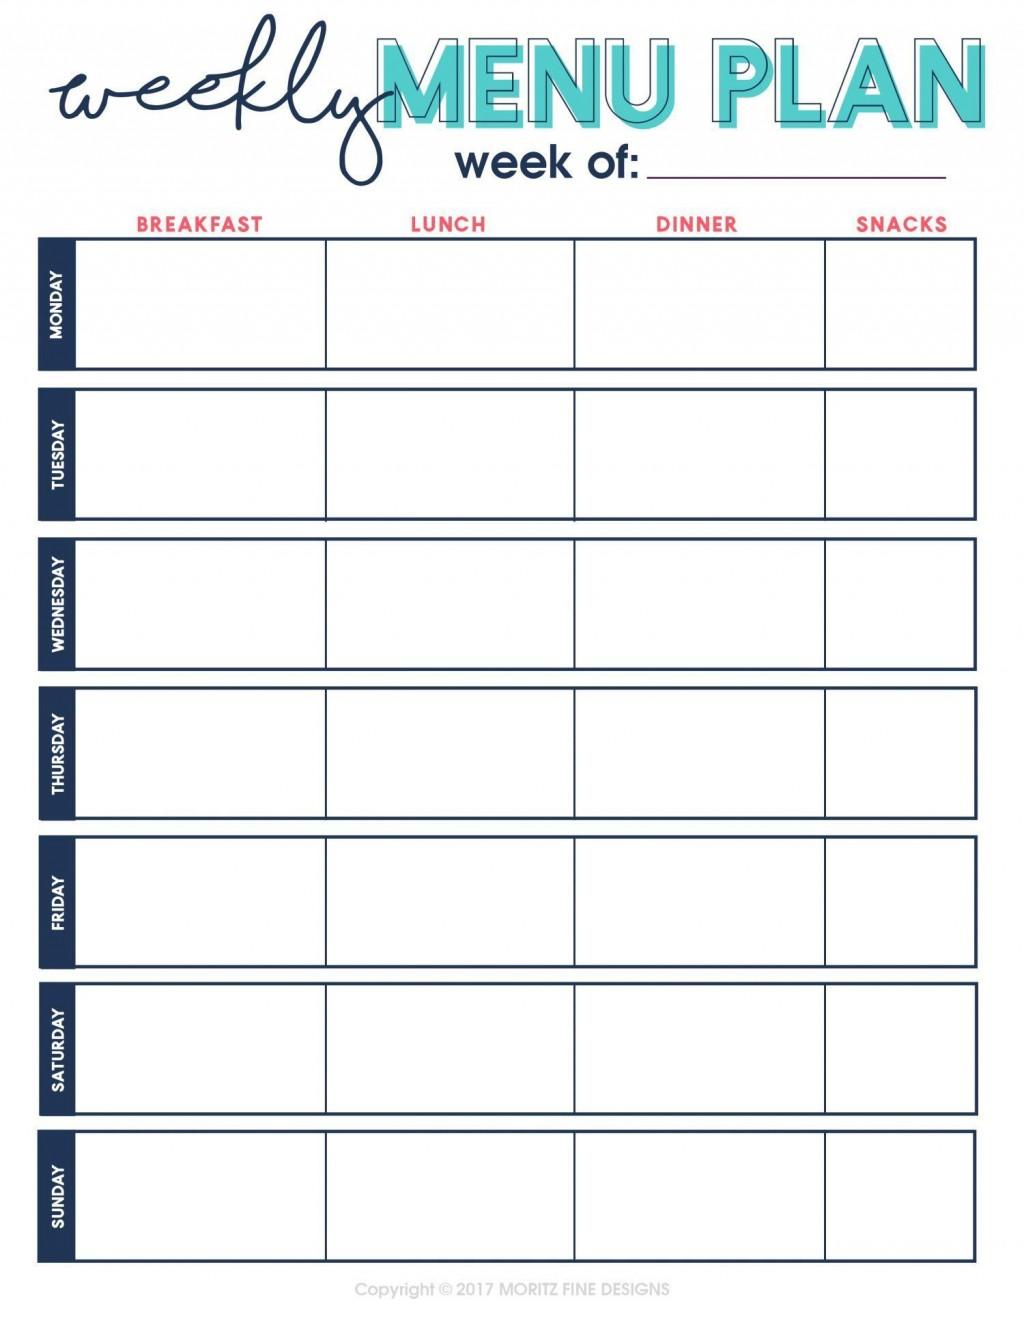 002 Unforgettable Weekly Eating Plan Template Concept  Food Planner Excel Meal DownloadLarge